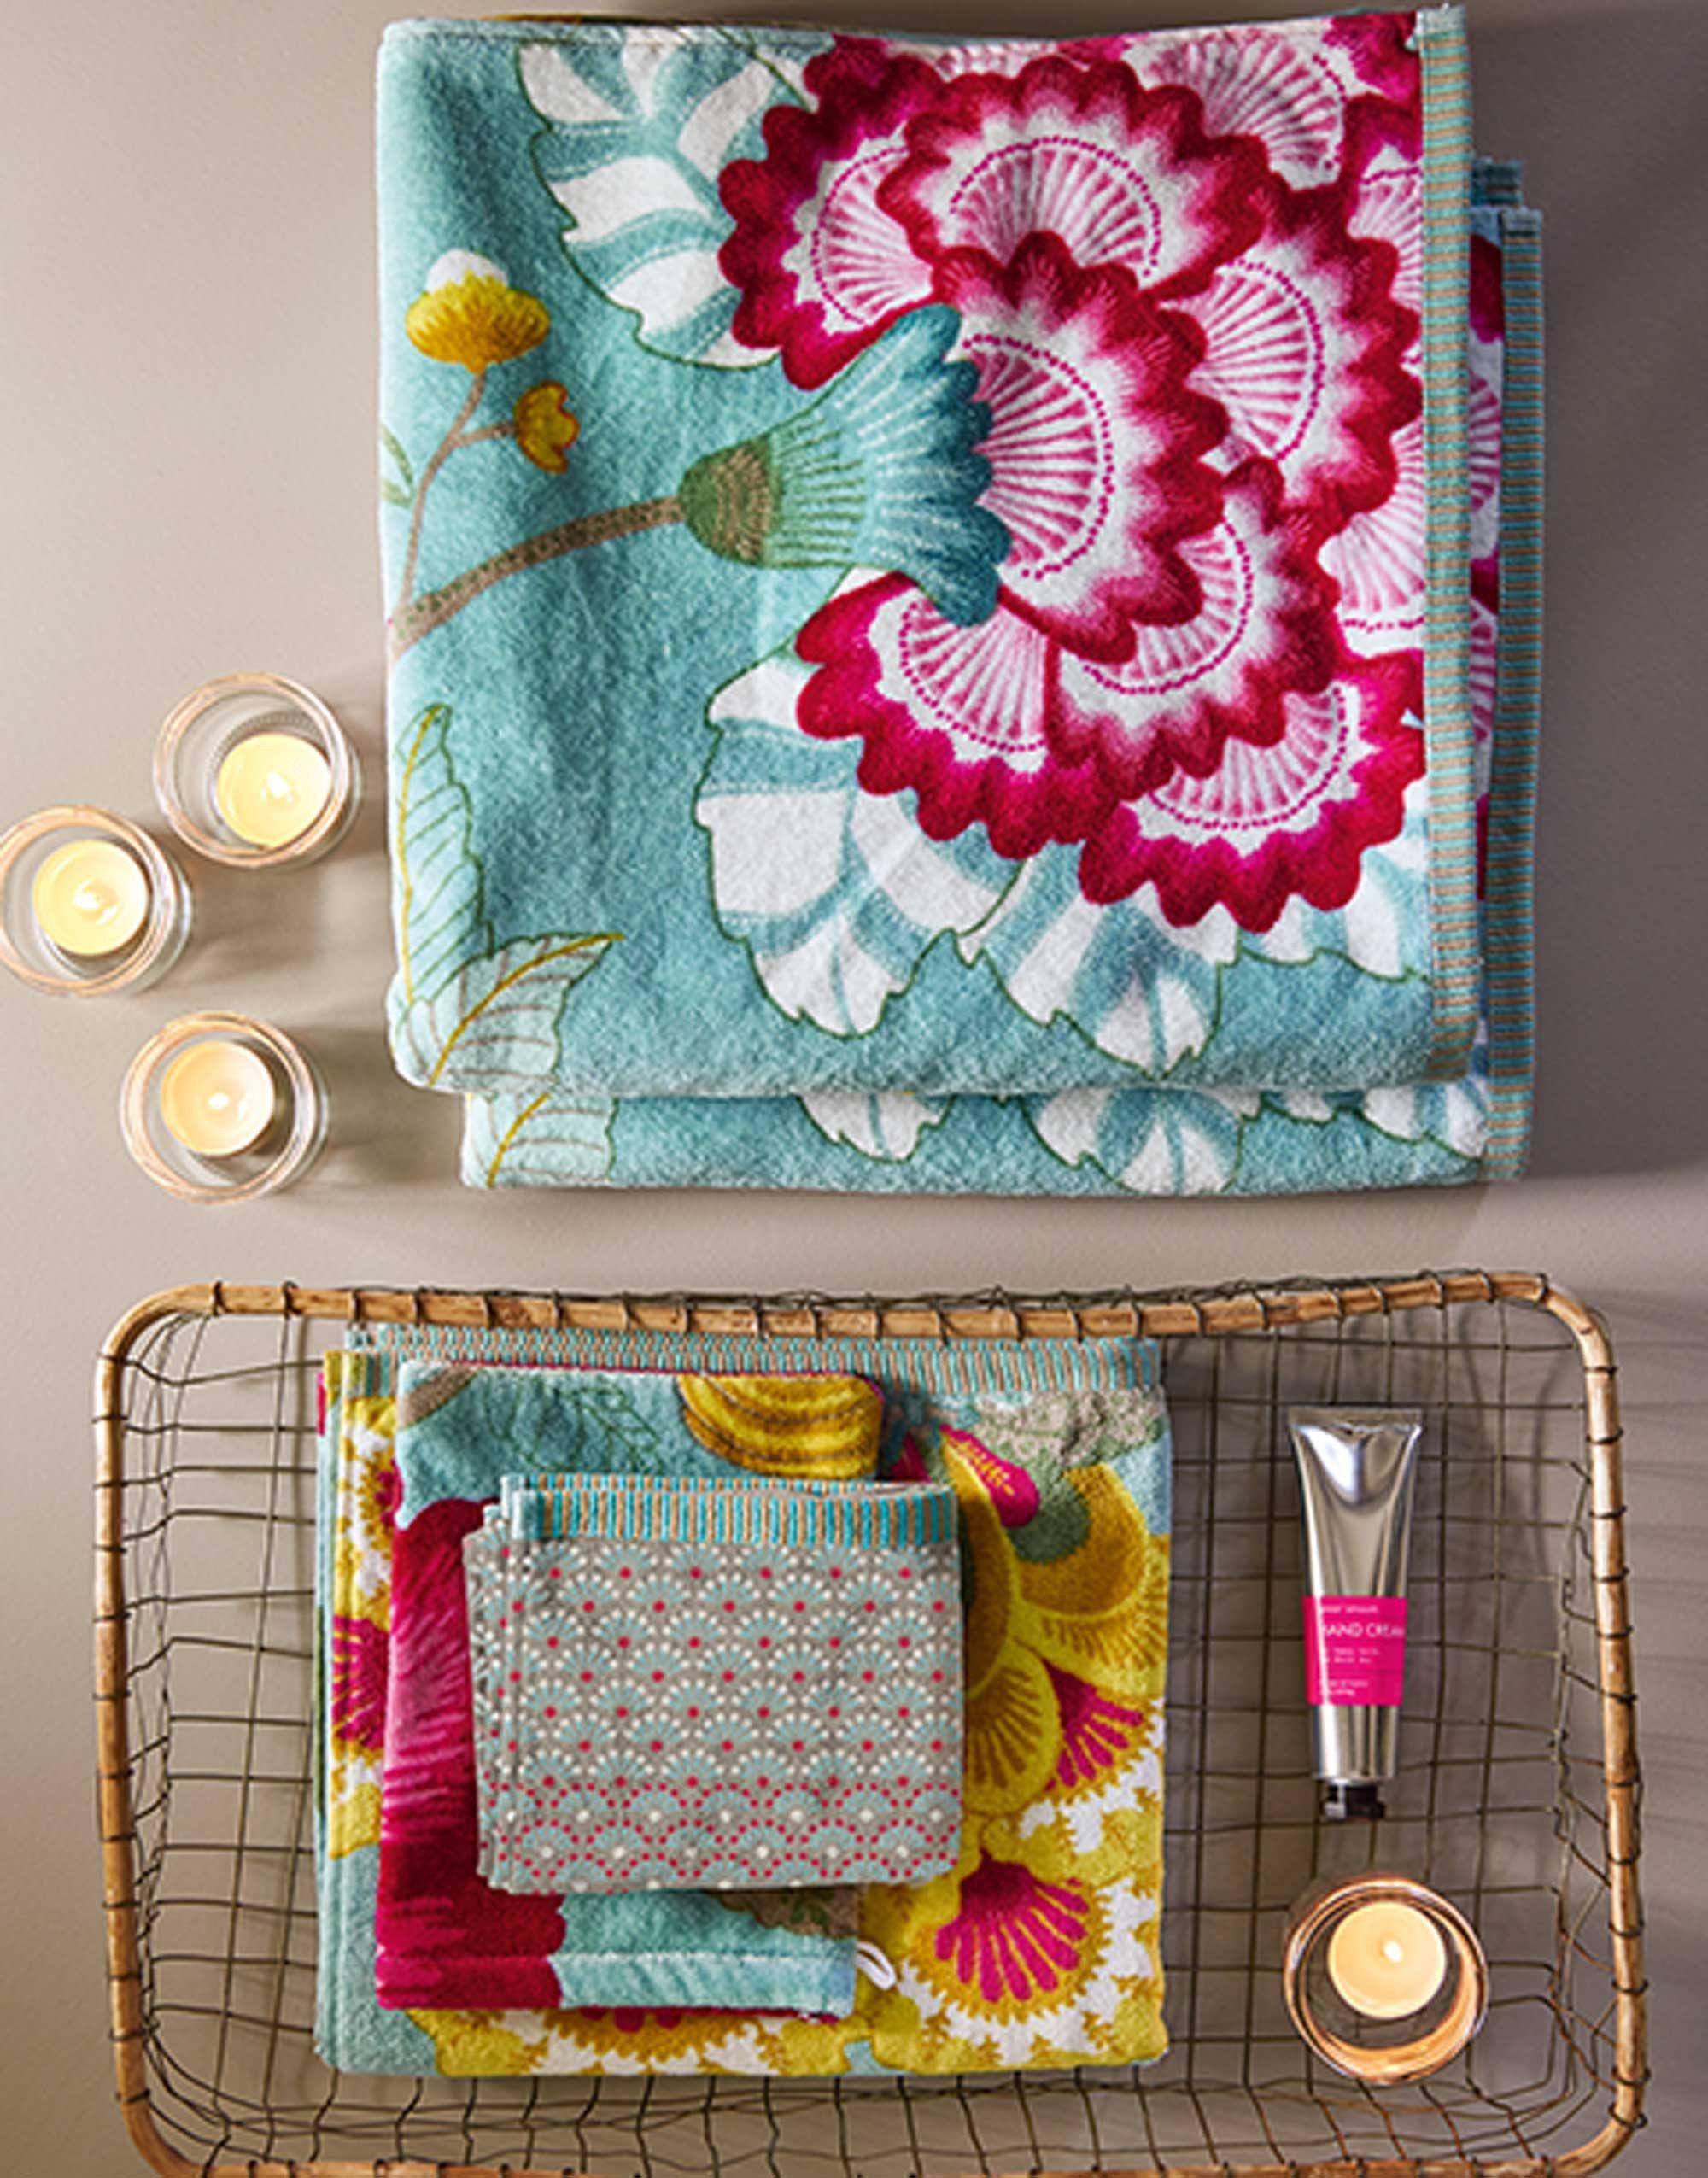 96d01c16aff Pip Studio Floral Fantasy Handdoek Licht petrol in 2019 | Just ...